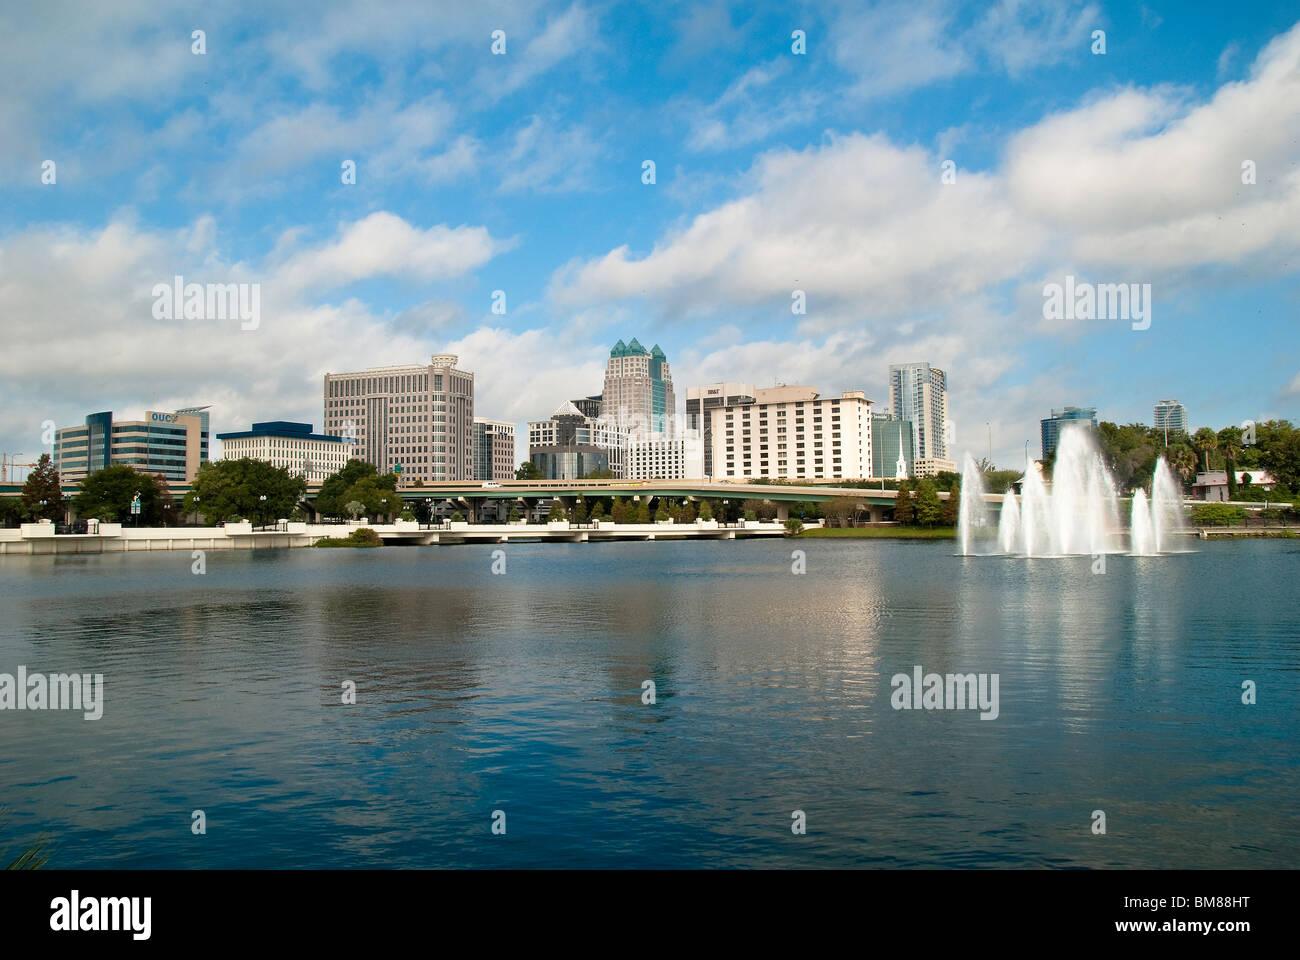 City Center and Lake Lucerne in Orlando, Florida, USA - Stock Image